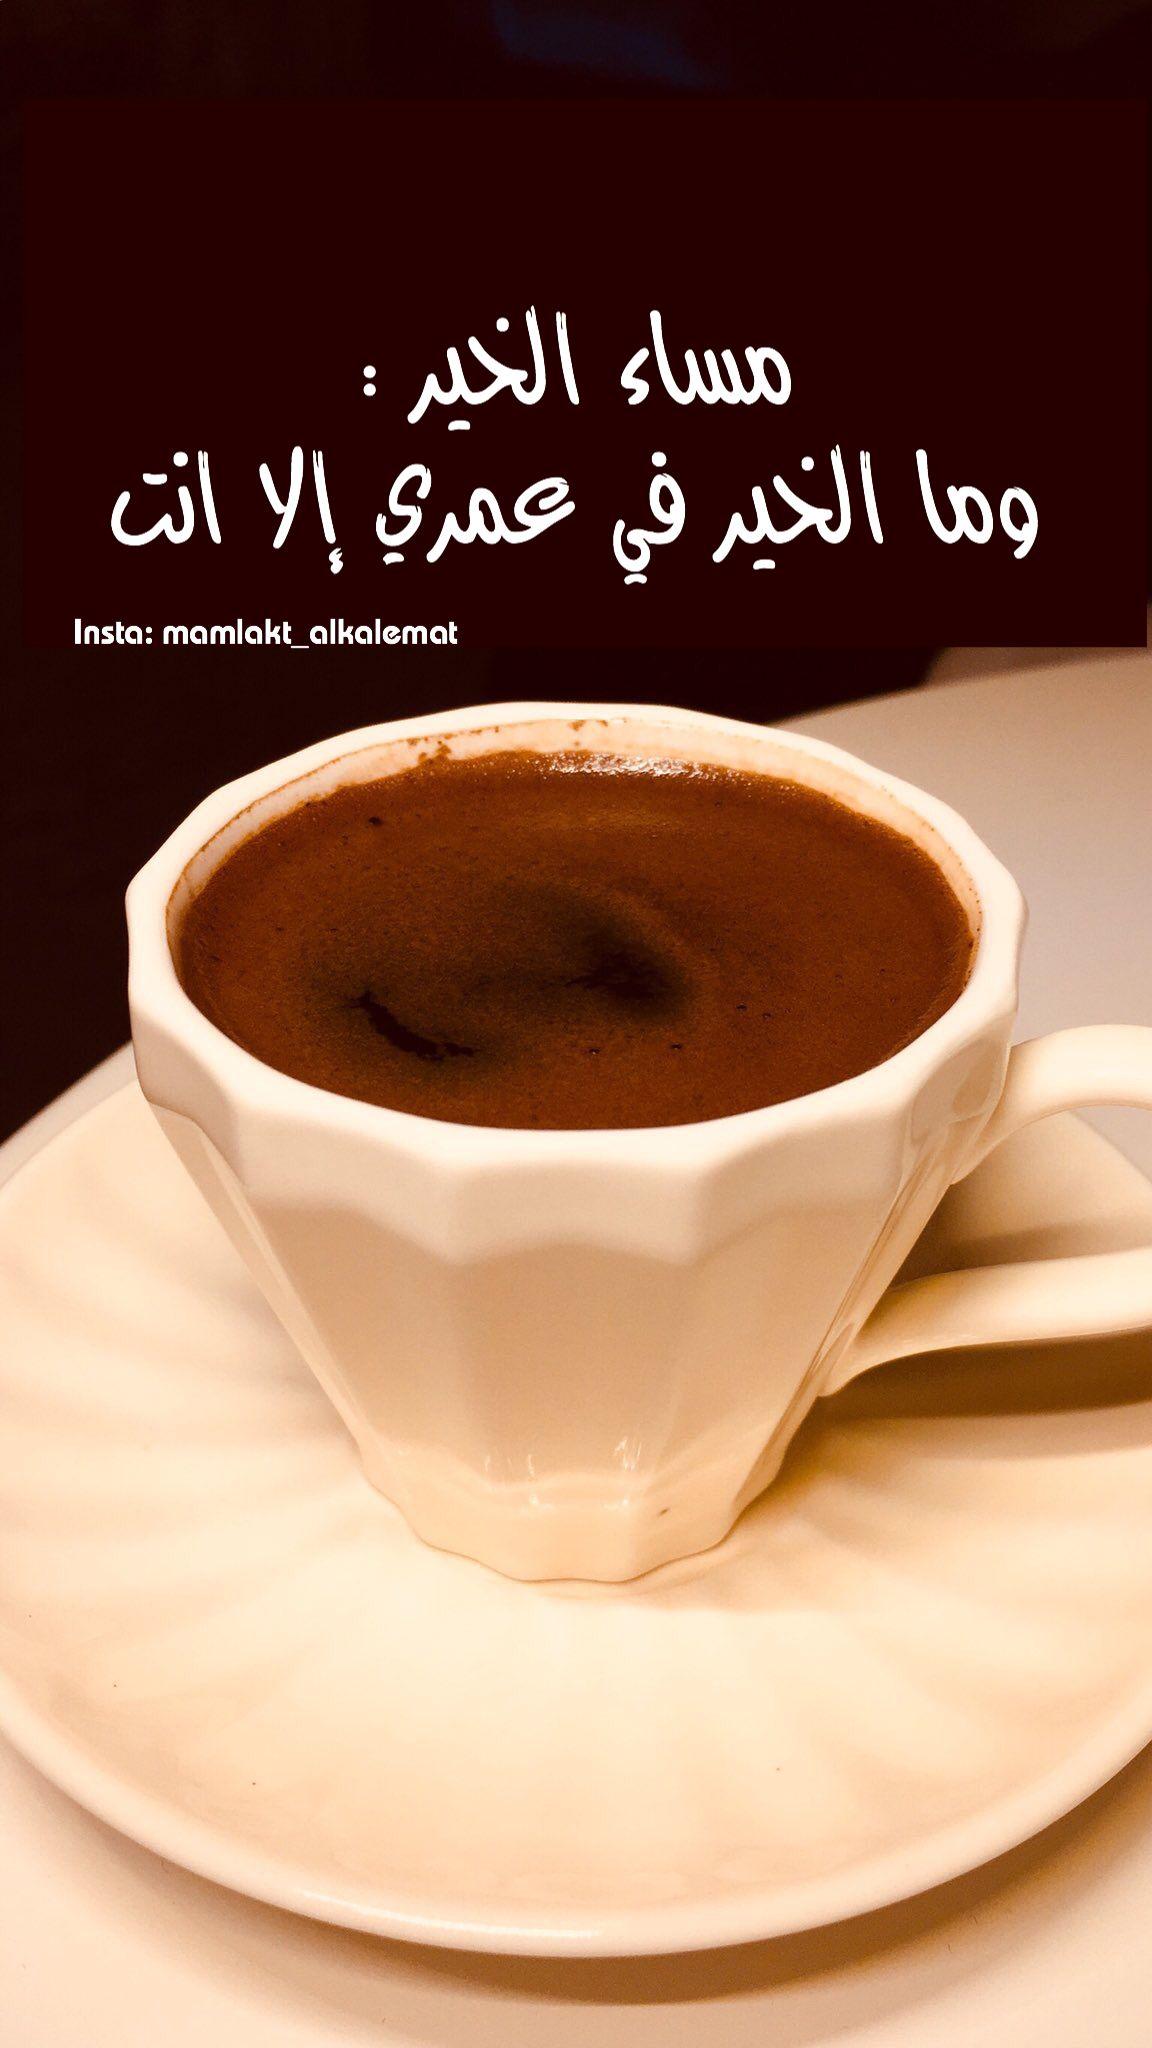 مـسـآئي آنت Arabic Calligraphy Art Good Evening My Coffee